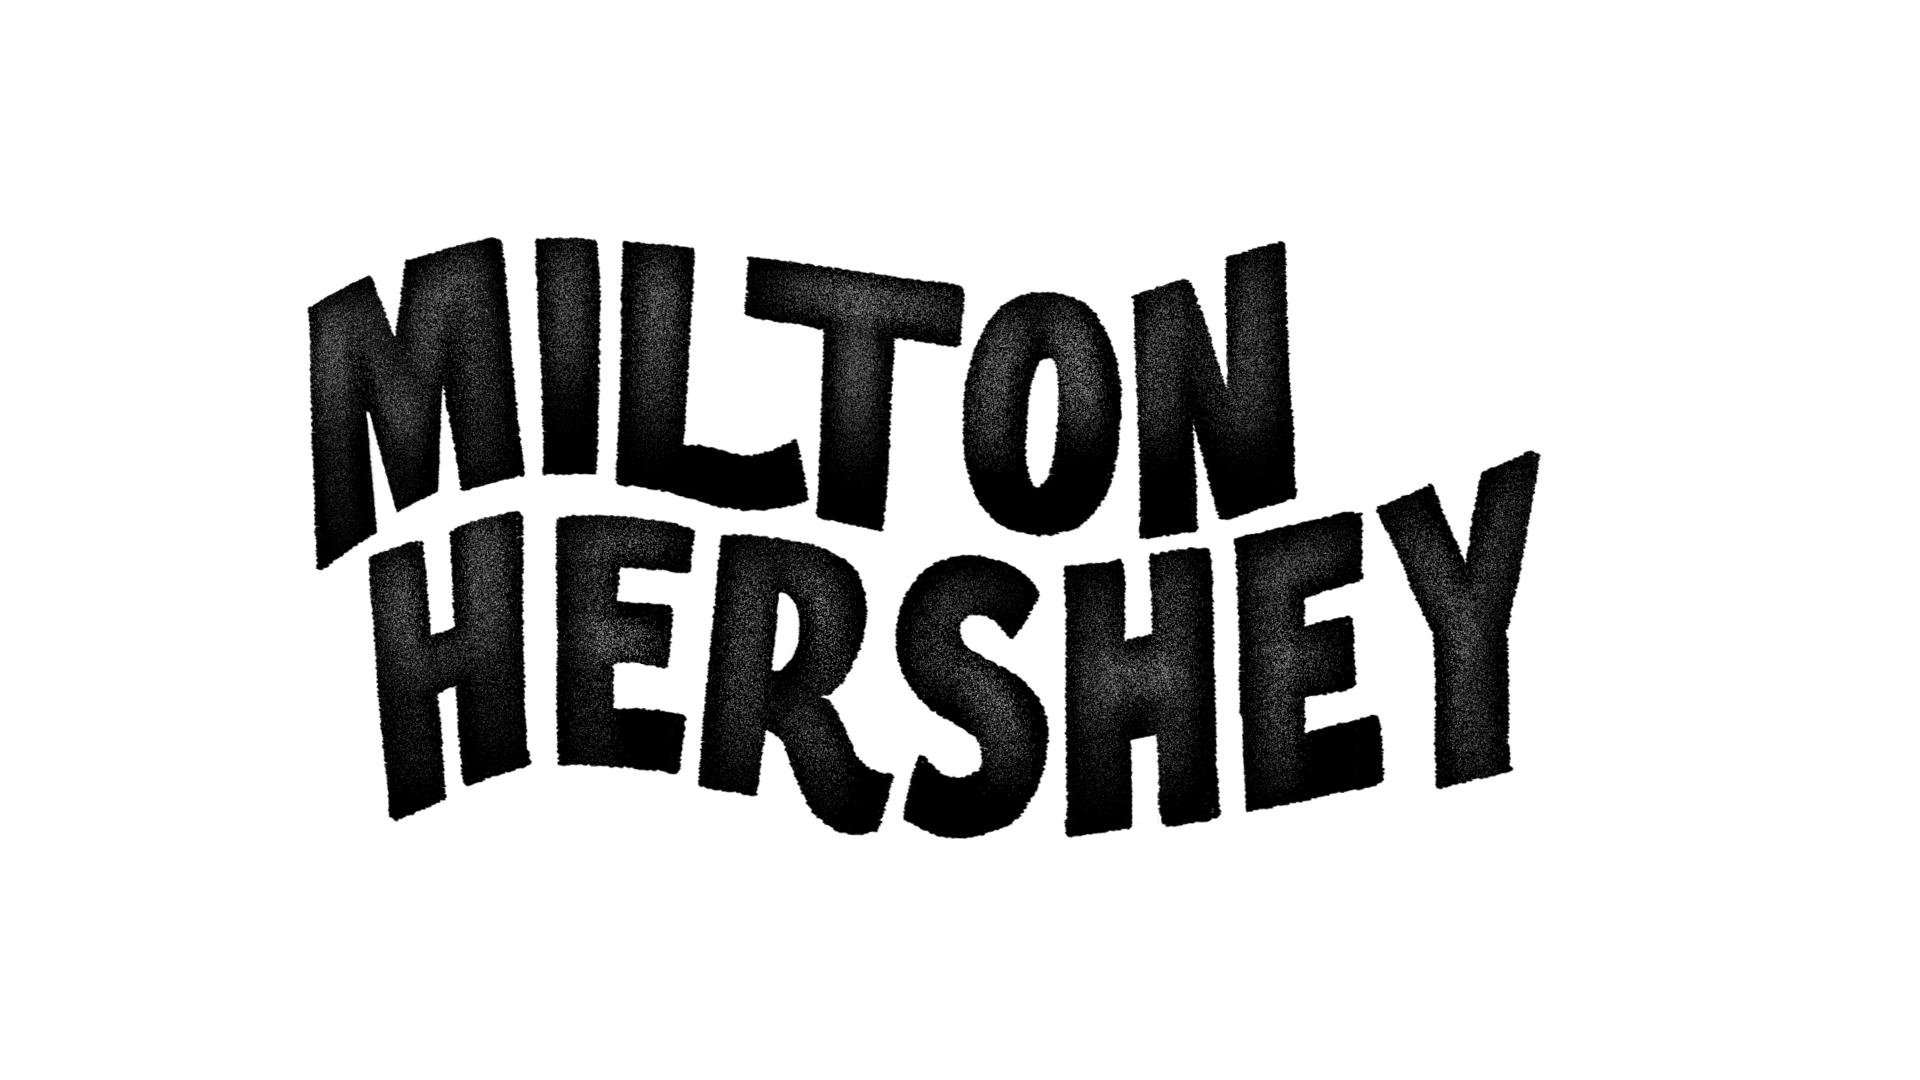 Hersheys_MiltonHershey_02.jpg